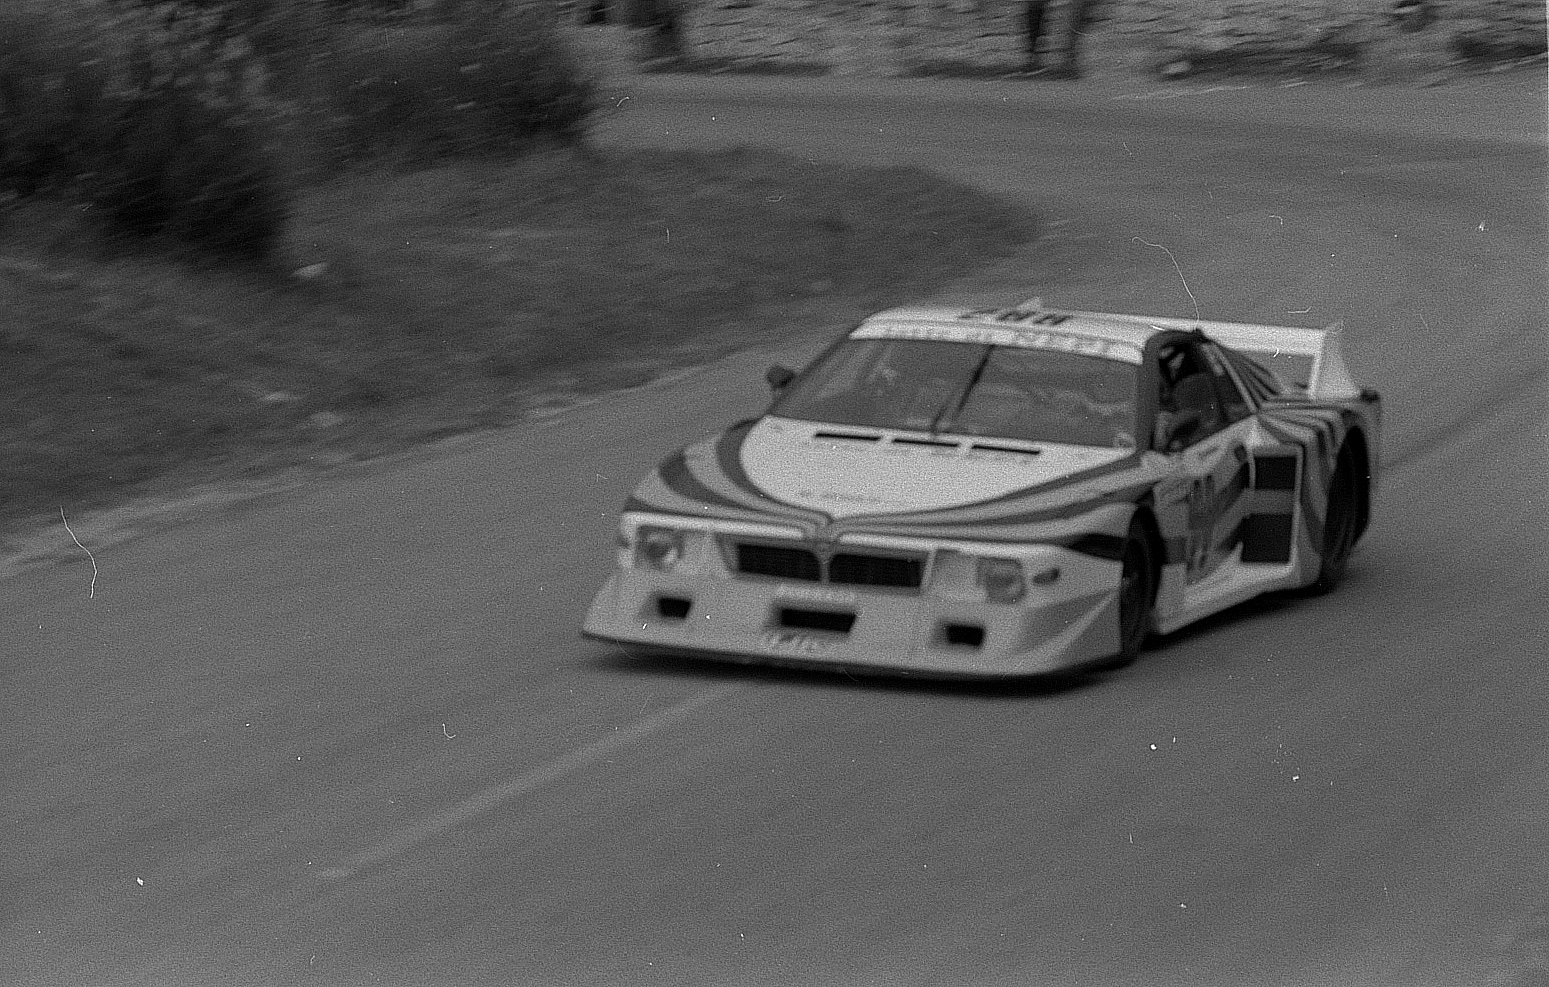 1981 Germano Nataloni - Lancia Beta Turbo